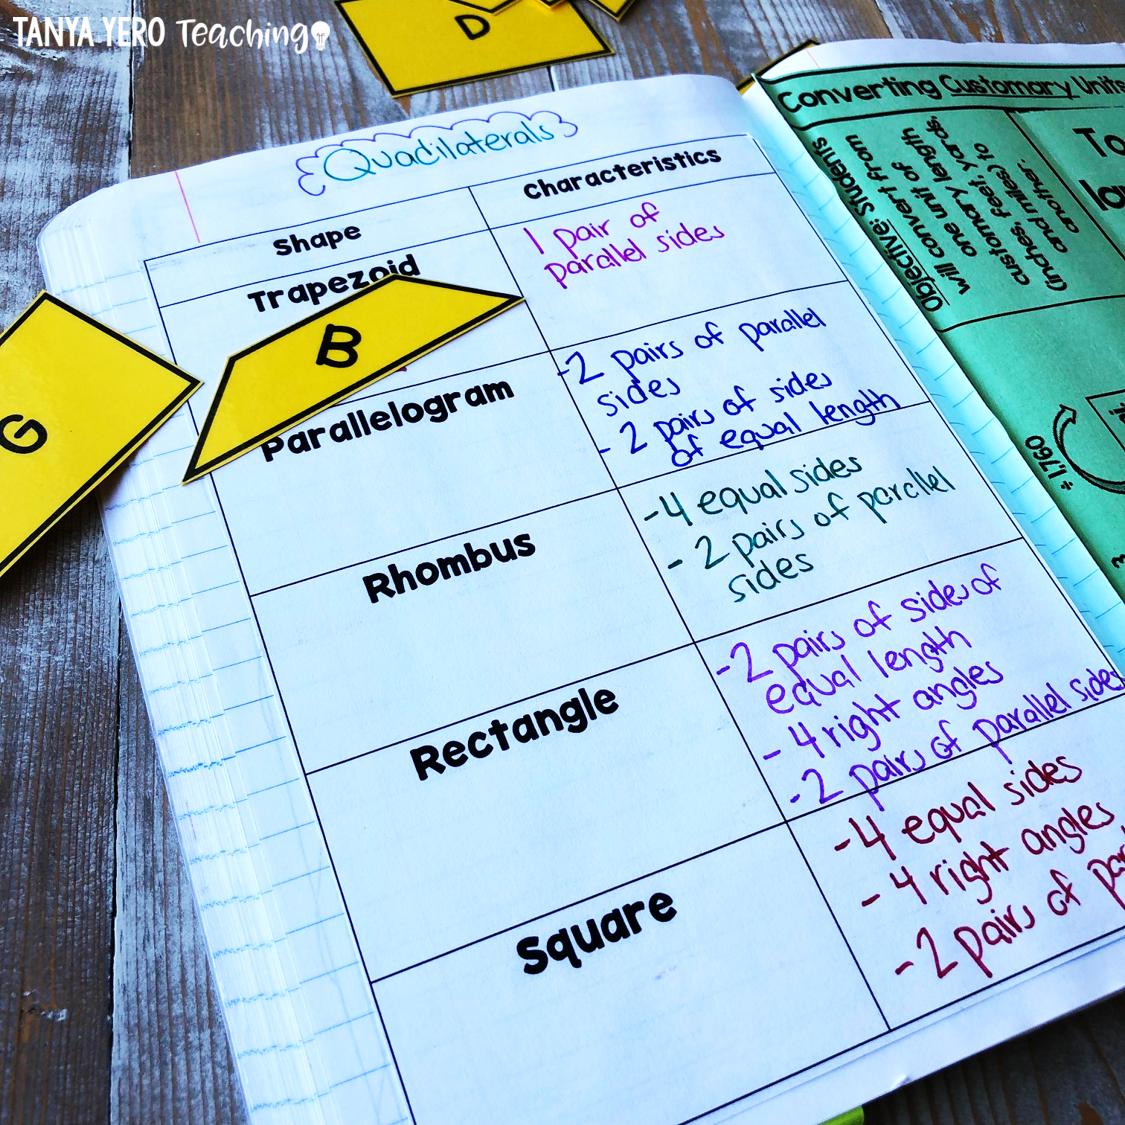 How To Conceptually Teach Quadrilaterals